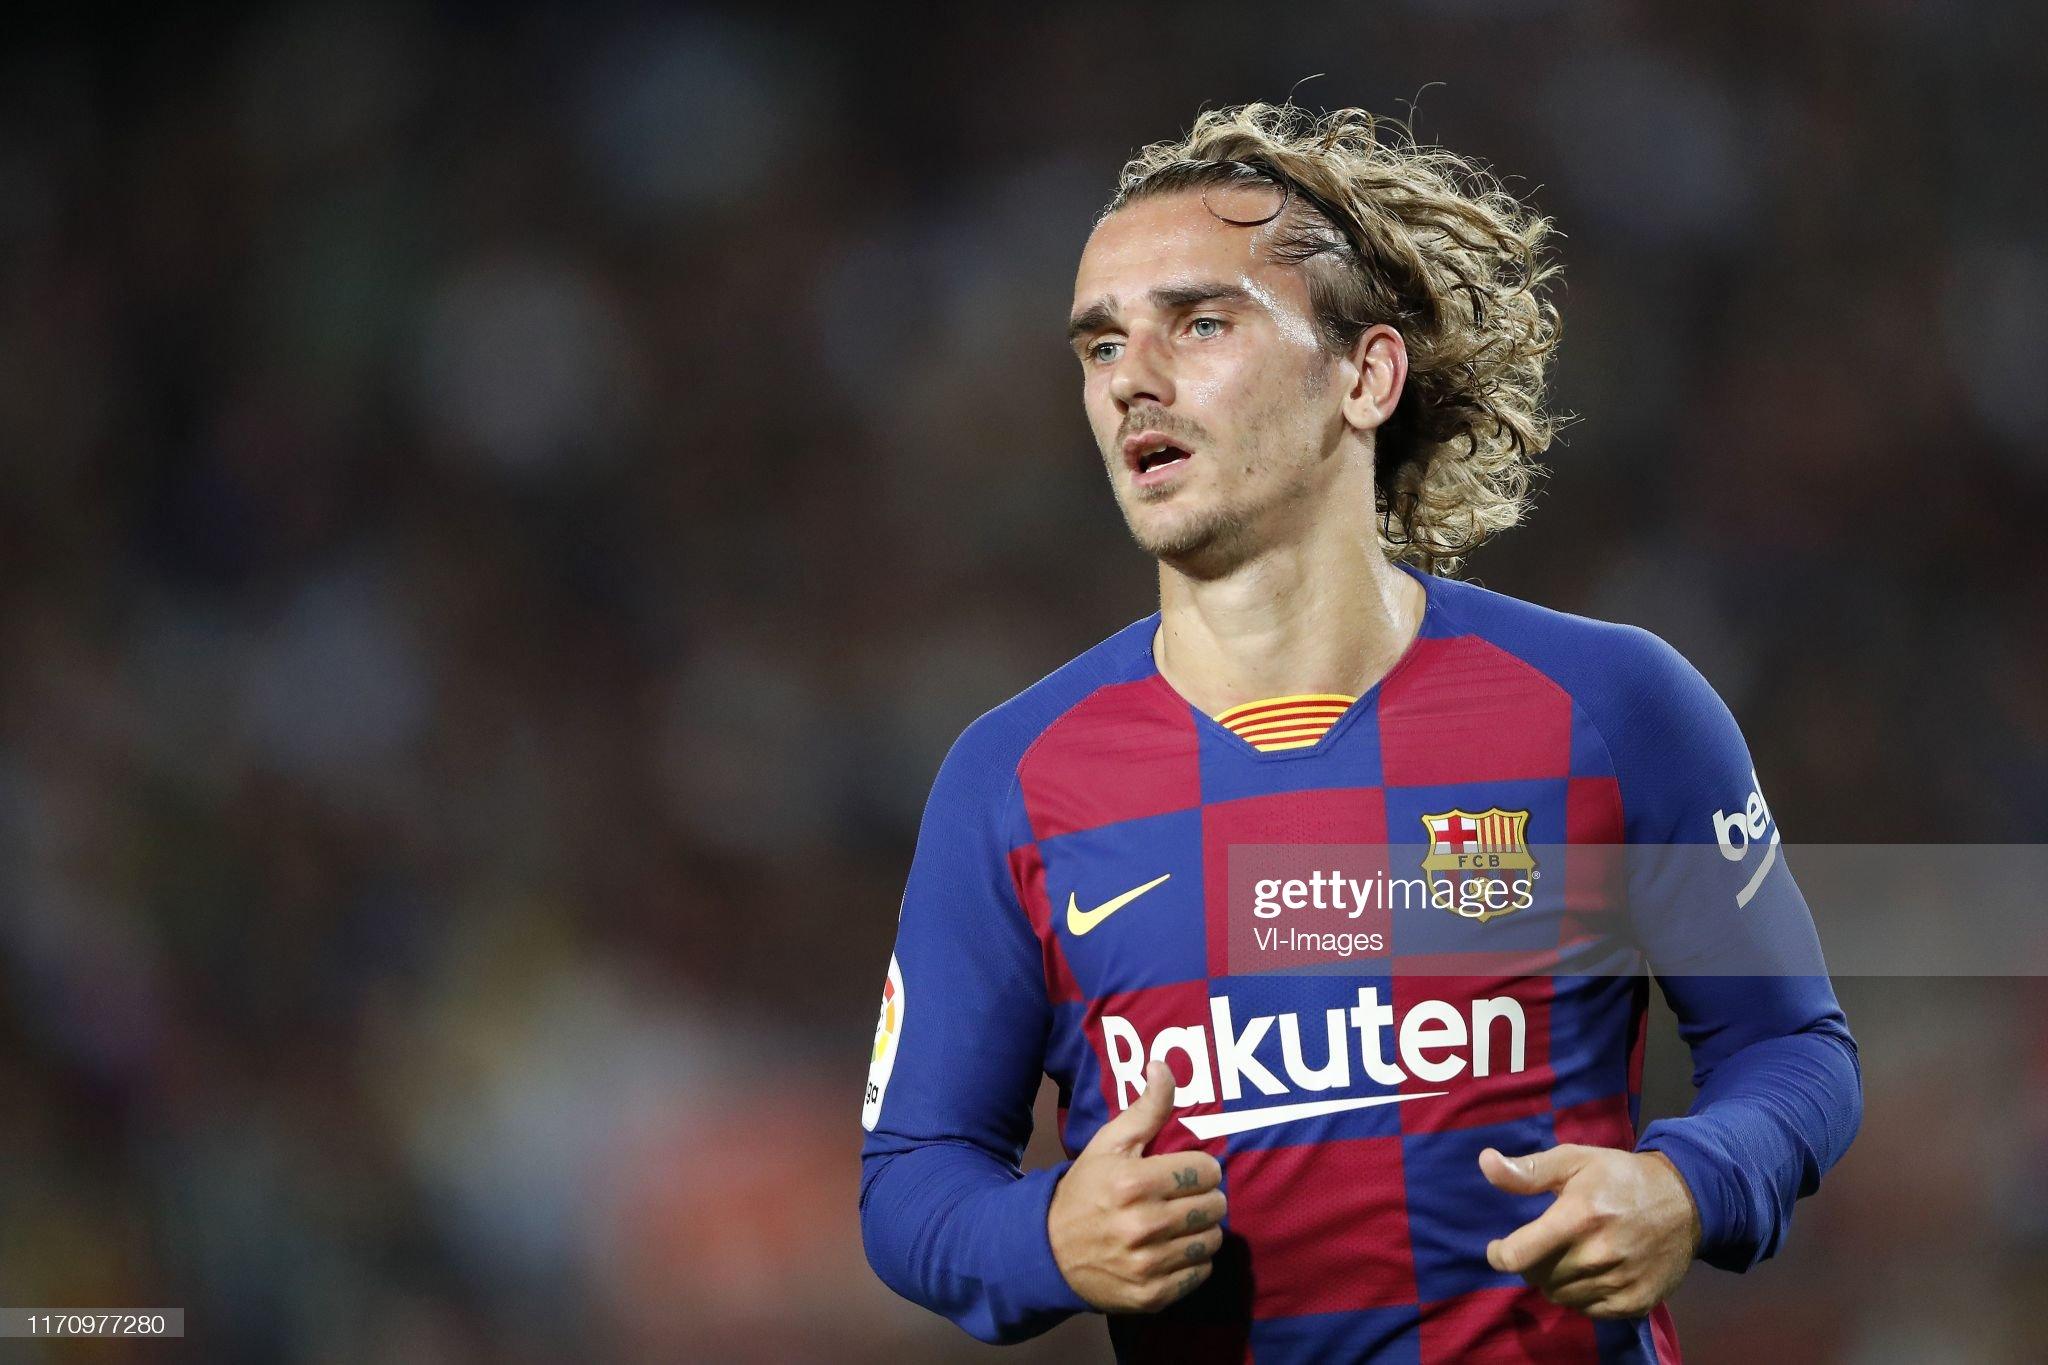 صور مباراة : برشلونة - فياريال 2-1 ( 24-09-2019 )  Antoine-griezmann-of-fc-barcelona-during-the-laliga-santander-match-picture-id1170977280?s=2048x2048